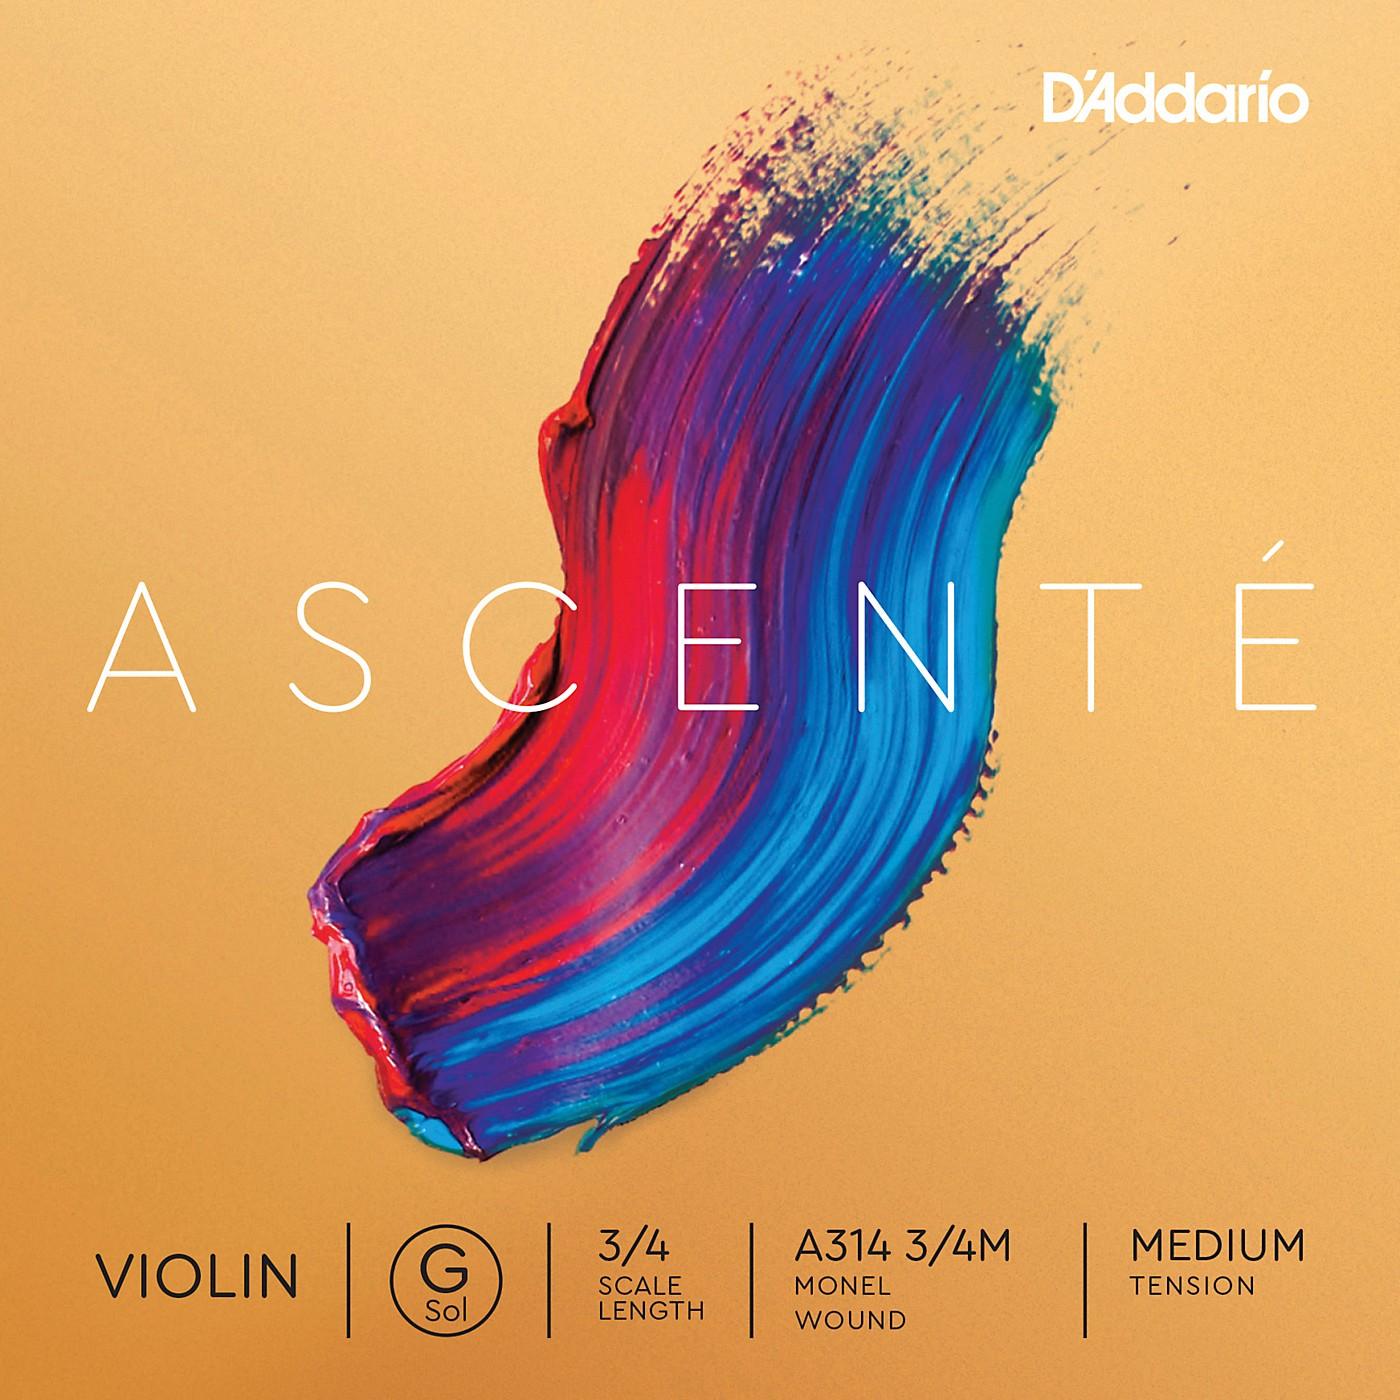 D'Addario Ascente Violin G String thumbnail